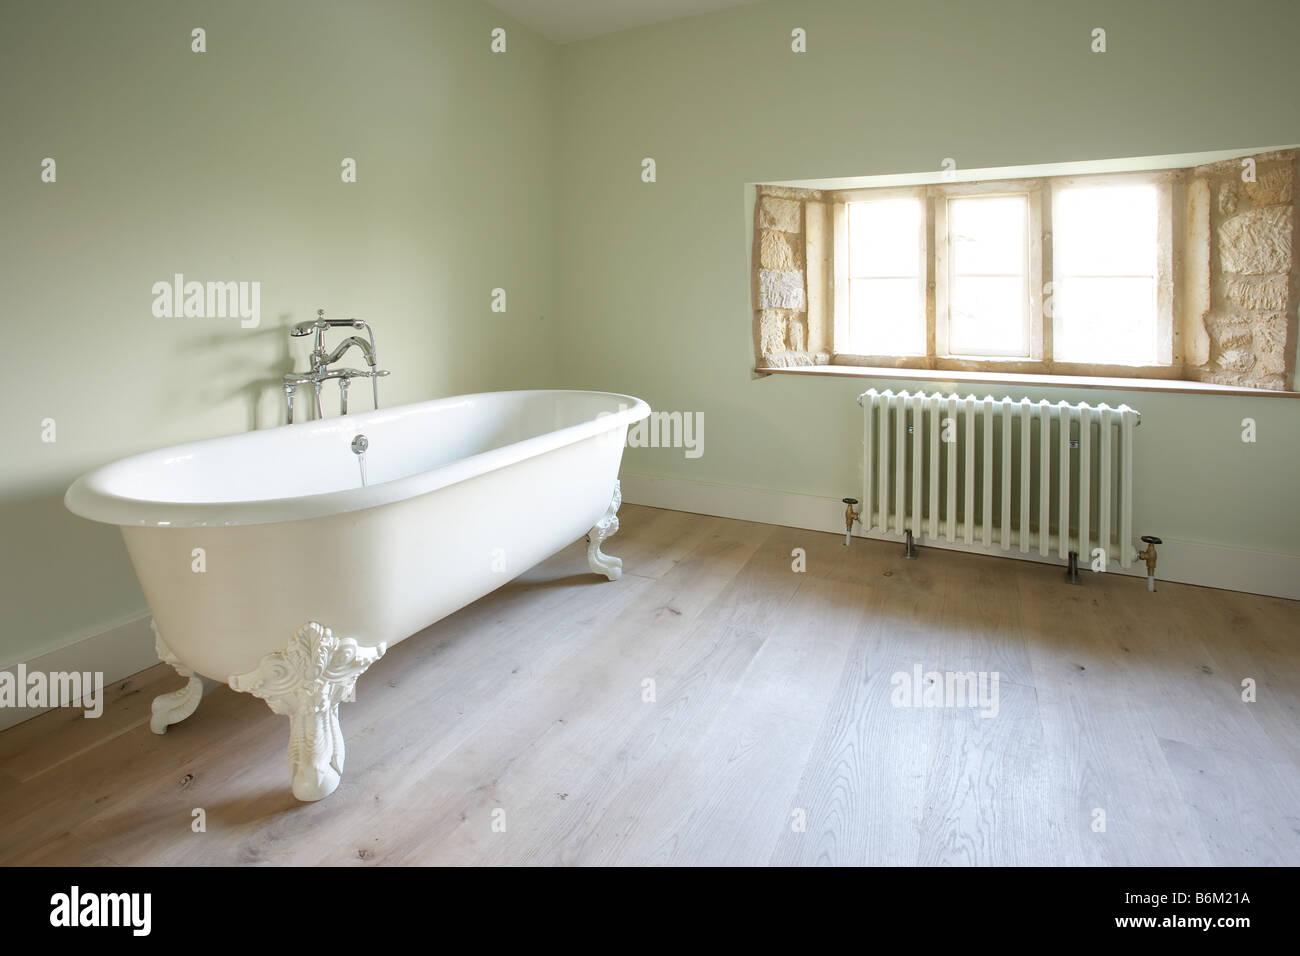 Freestanding Victorian Style White Bath Tub Bathtub In